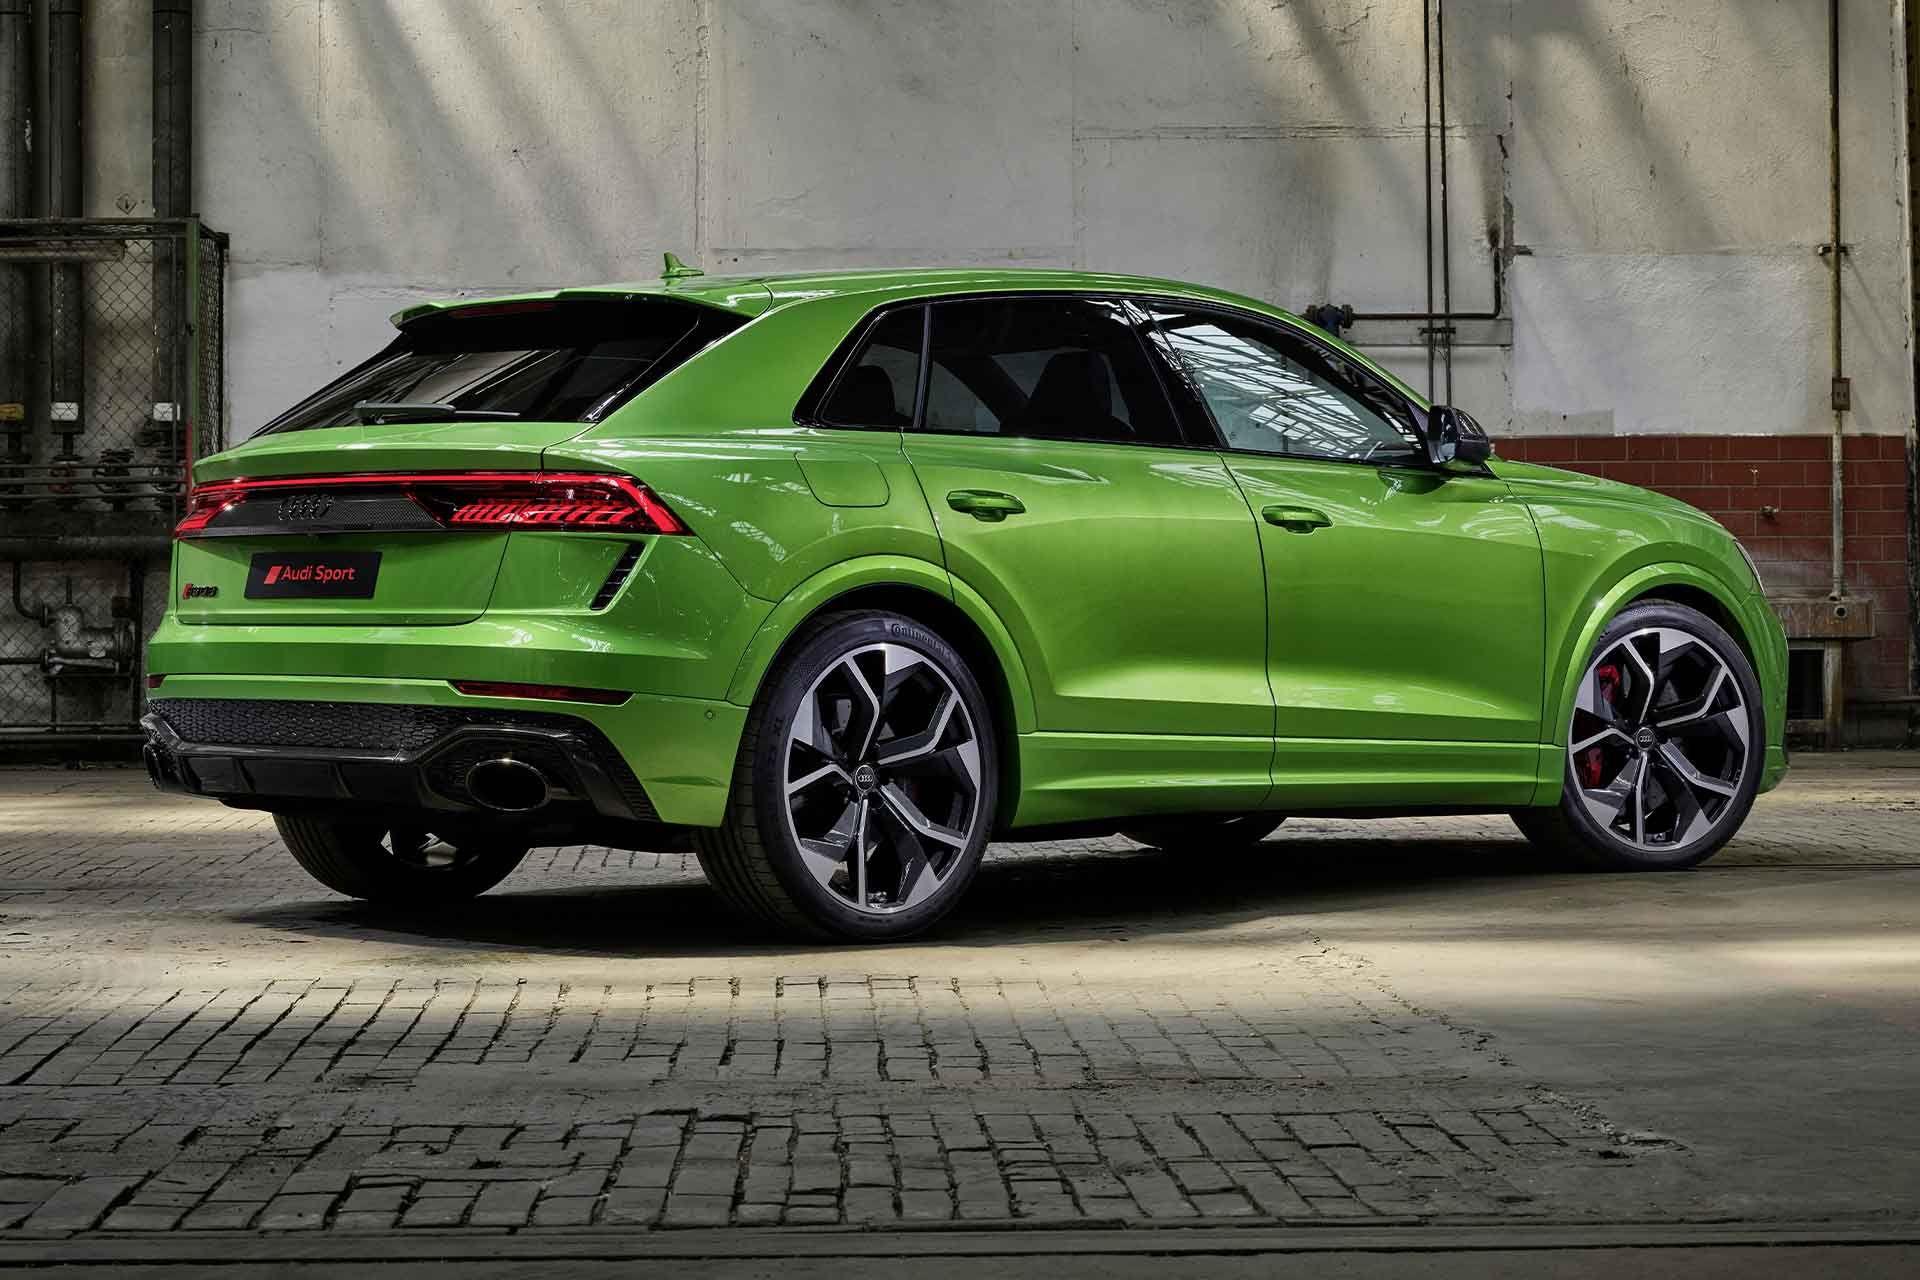 Audi Rs Q8 Suv In 2020 Audi Rs Audi Suv